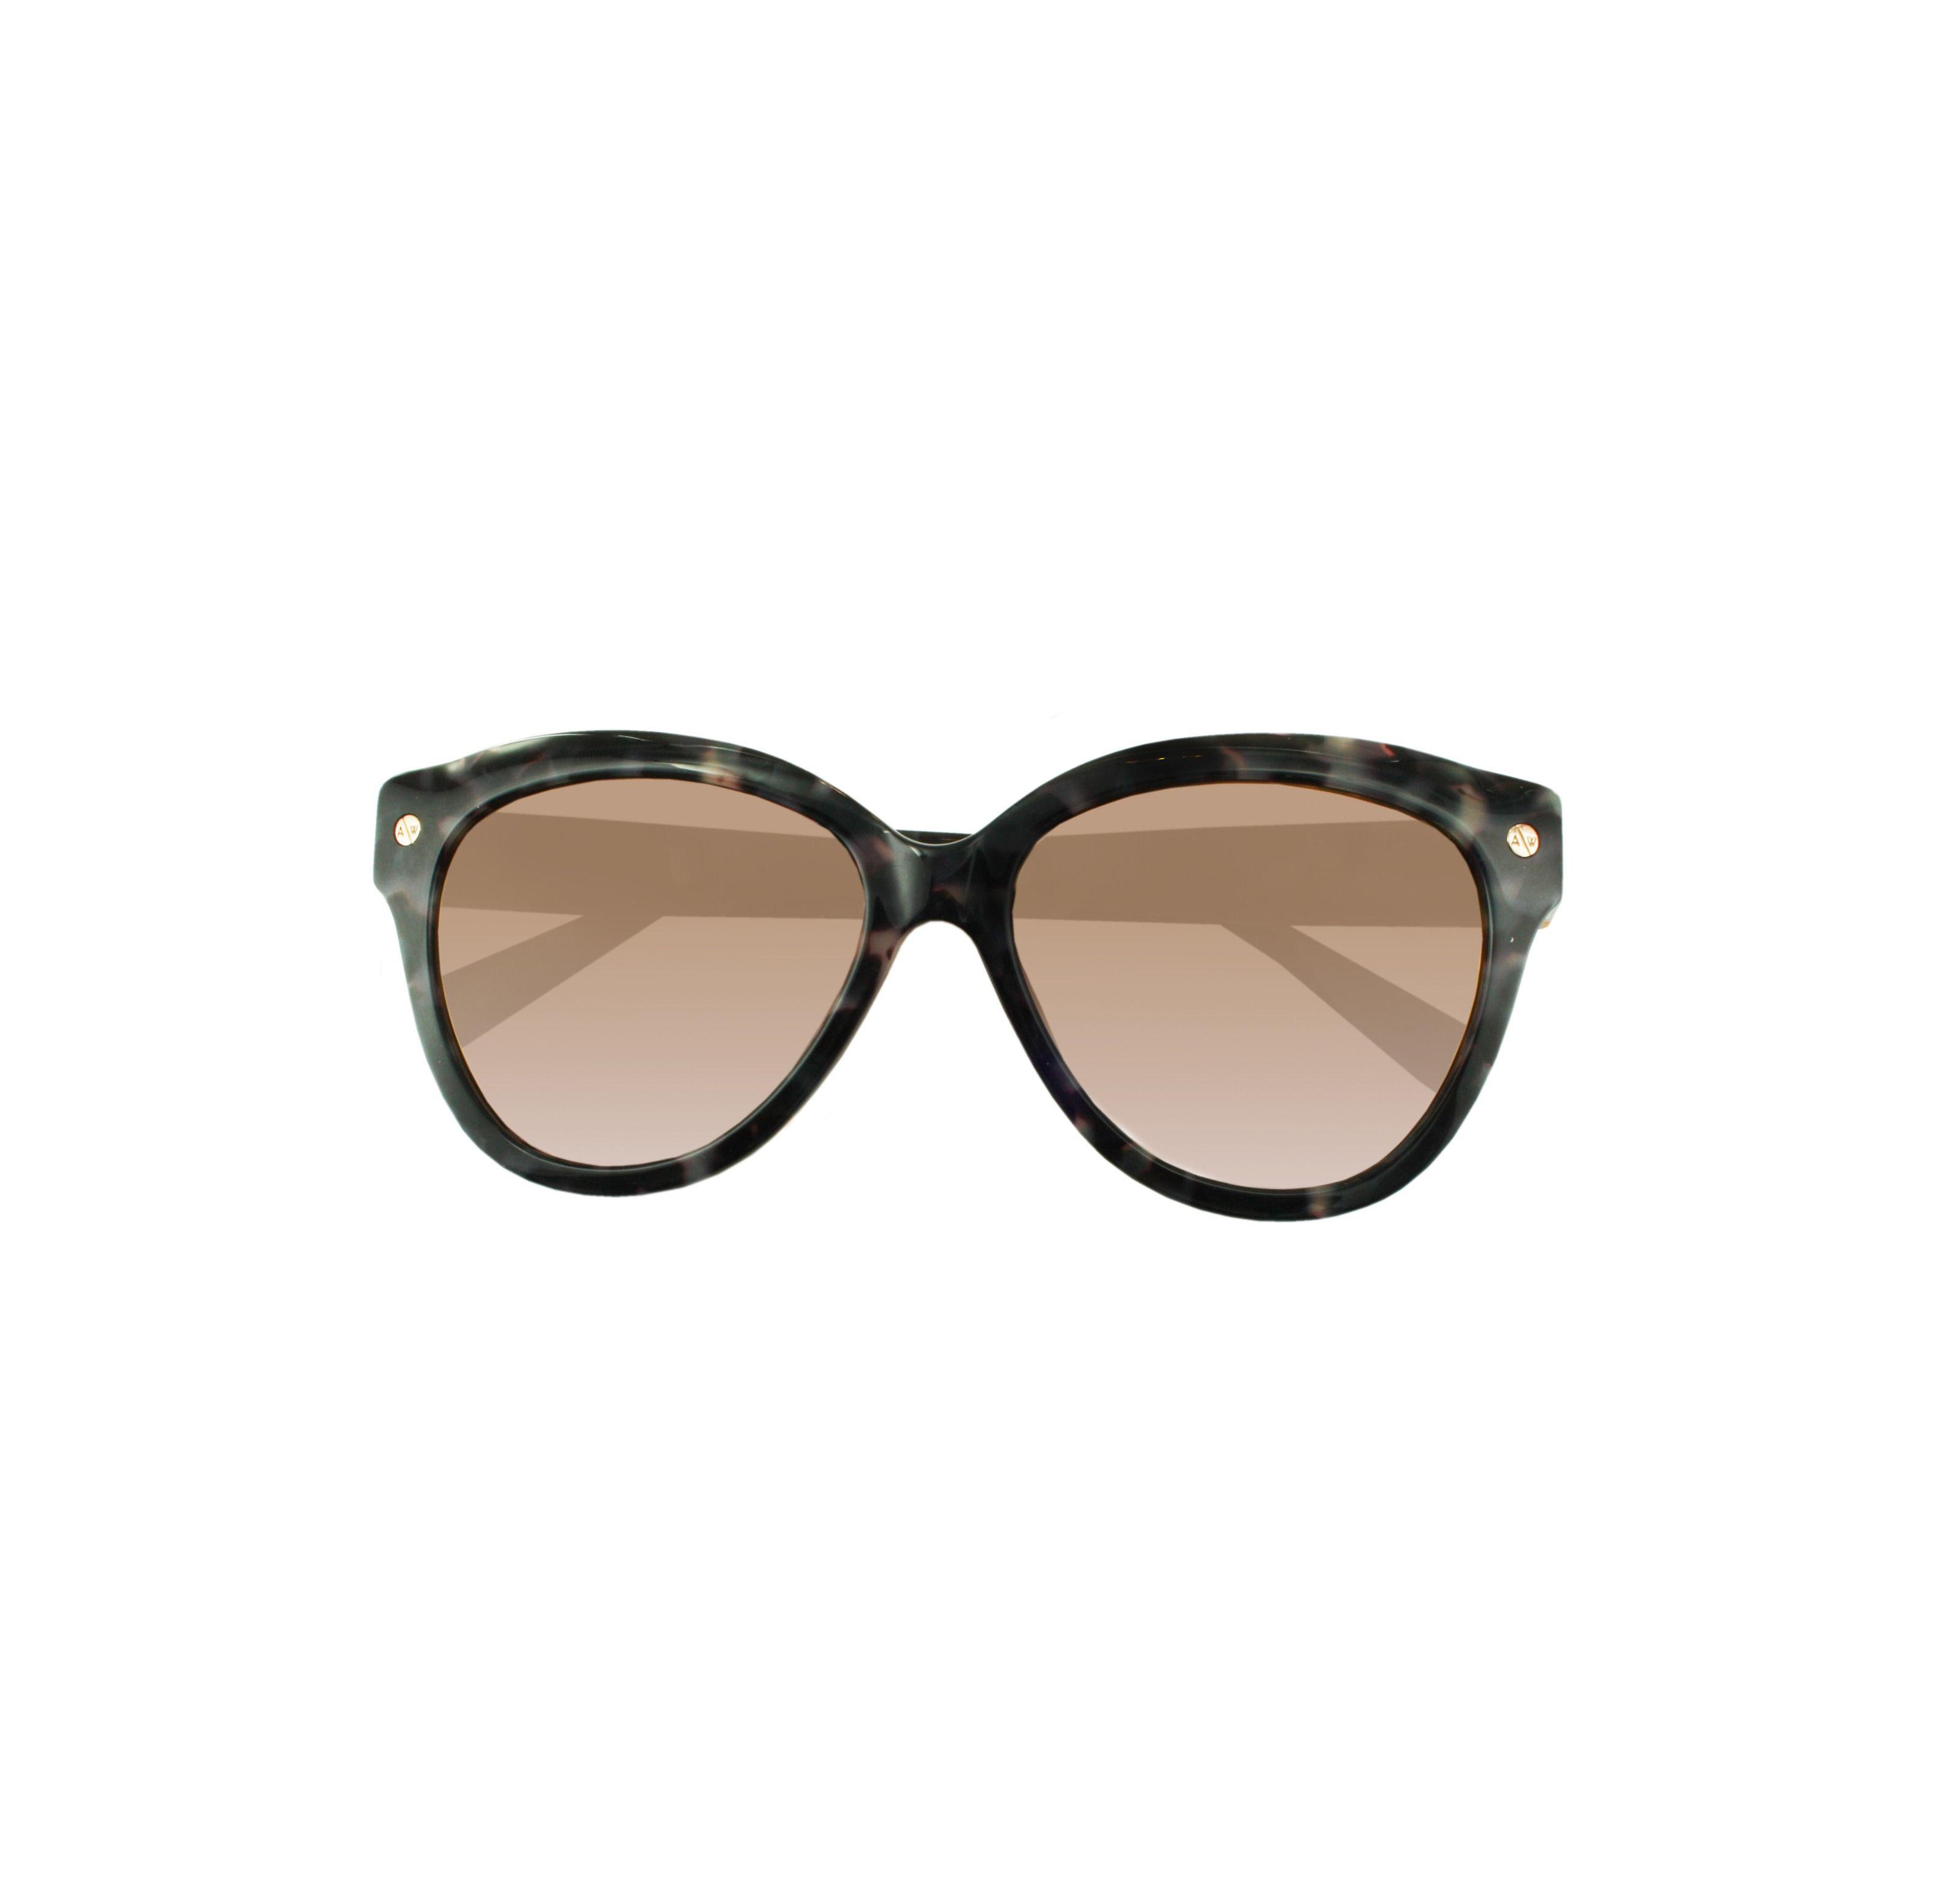 4bbc8975ea Amanda Wakeley. Women s Gray The Chelsea Charcoal Tortoiseshell Sunglasses